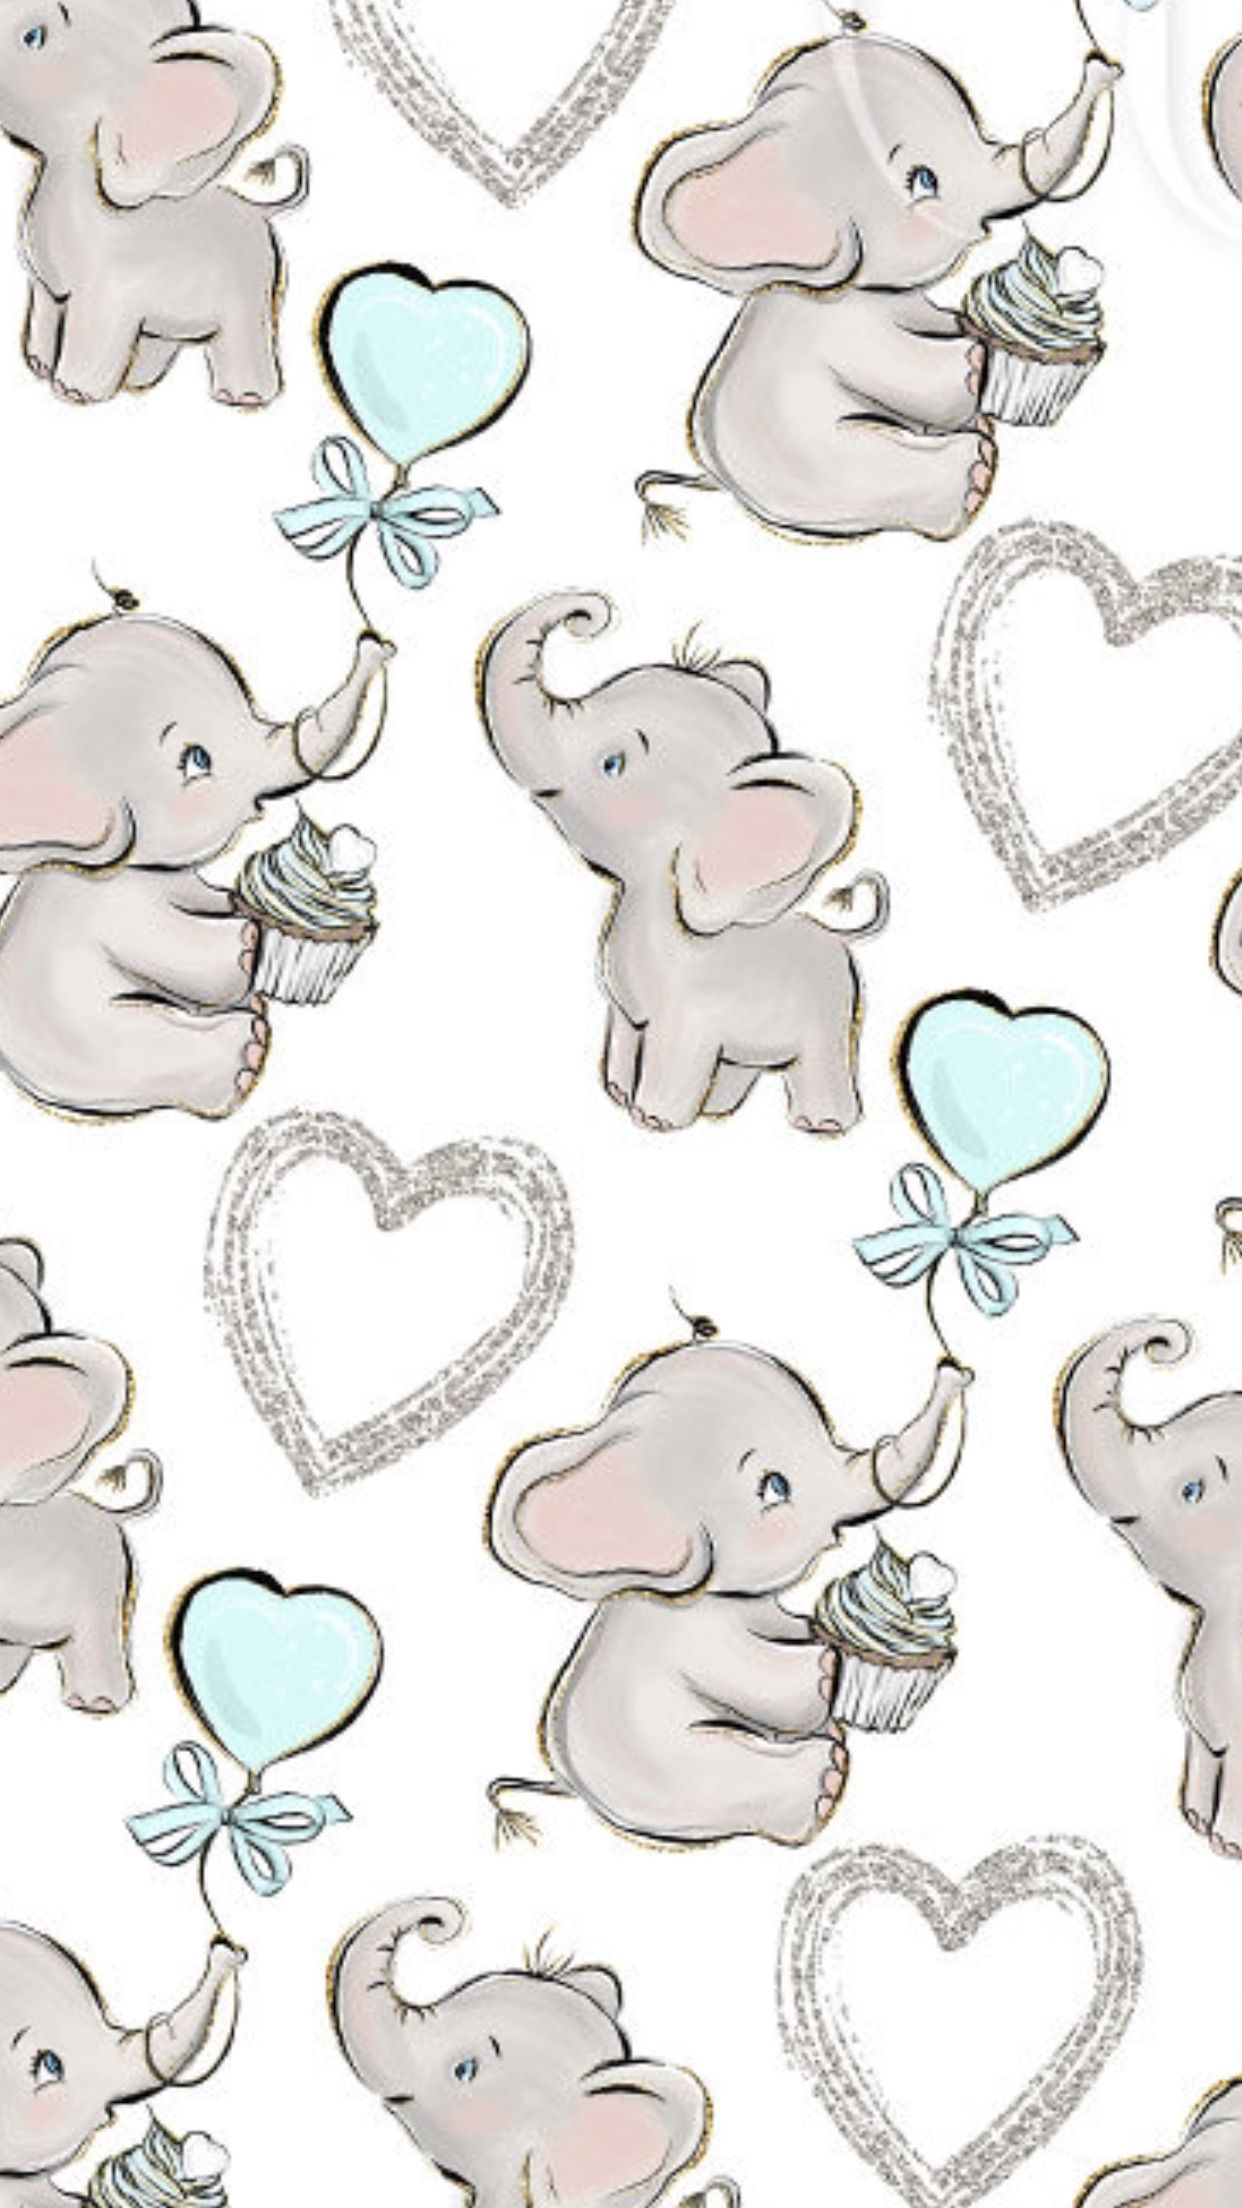 Juan Mateo Elephant Wallpaper Wallpaper Iphone Cute Baby Wallpaper